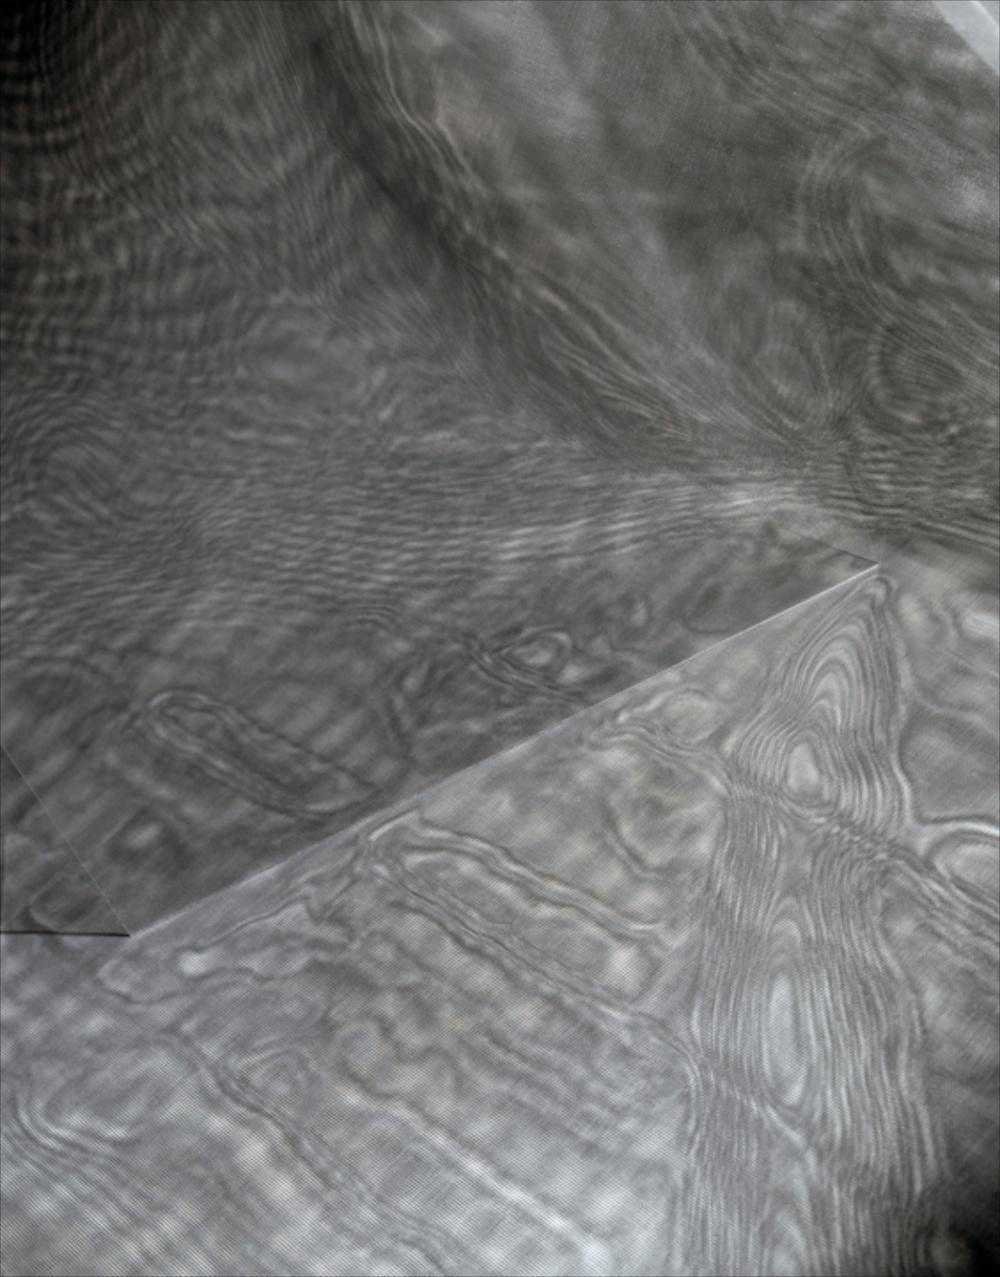 "Barbara Kasten Phantom Lines 20 2007 Archival pigment print 16"" x 12 3/4"" BK004"